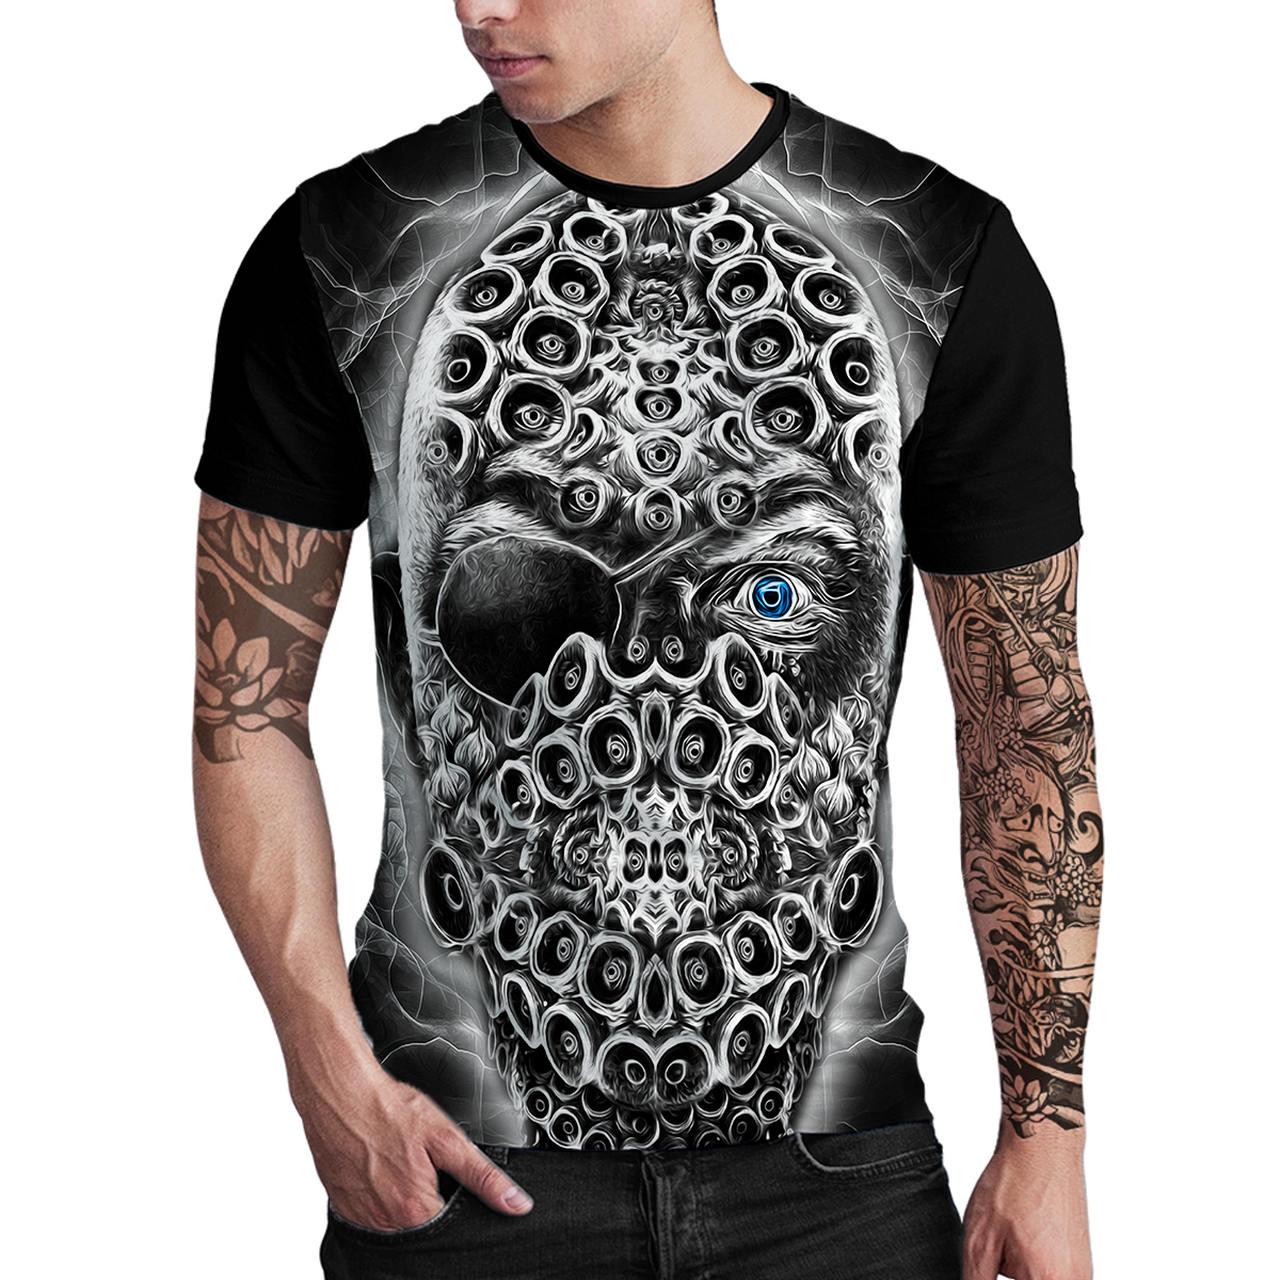 Stompy Camiseta Estampada Masculina Modelo 75